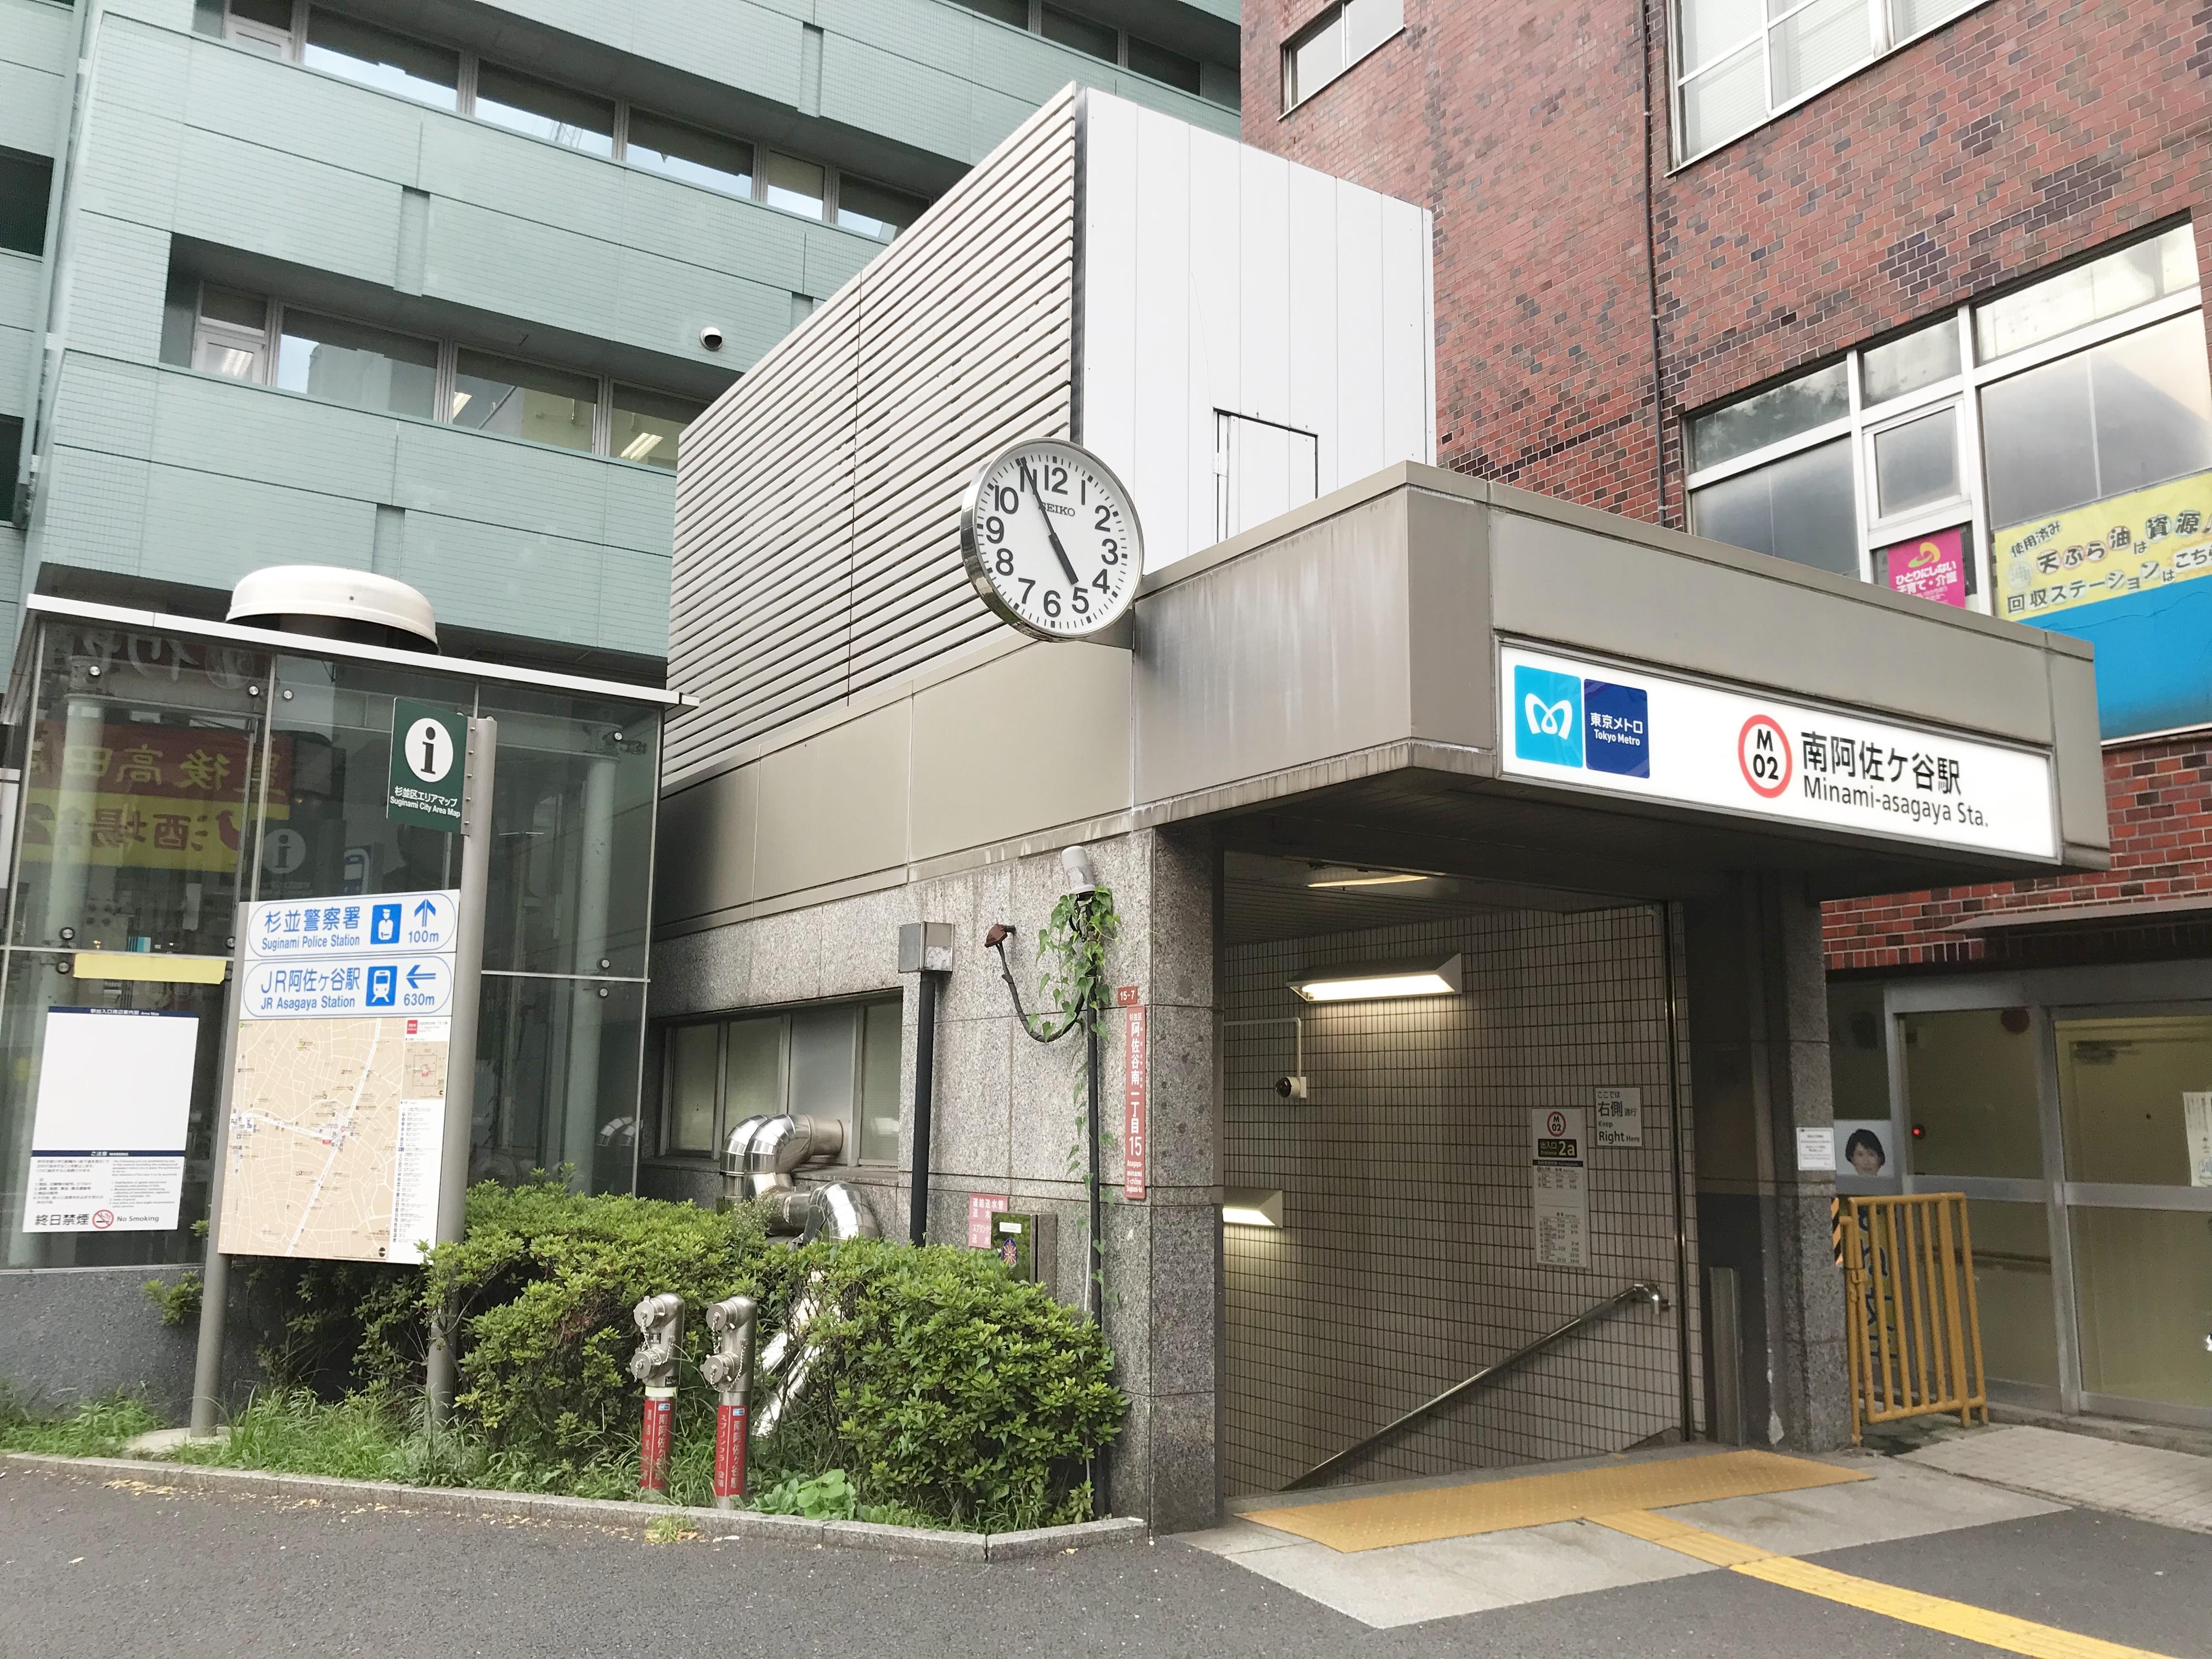 Minami-asagaya-station-Exit2a.jpg